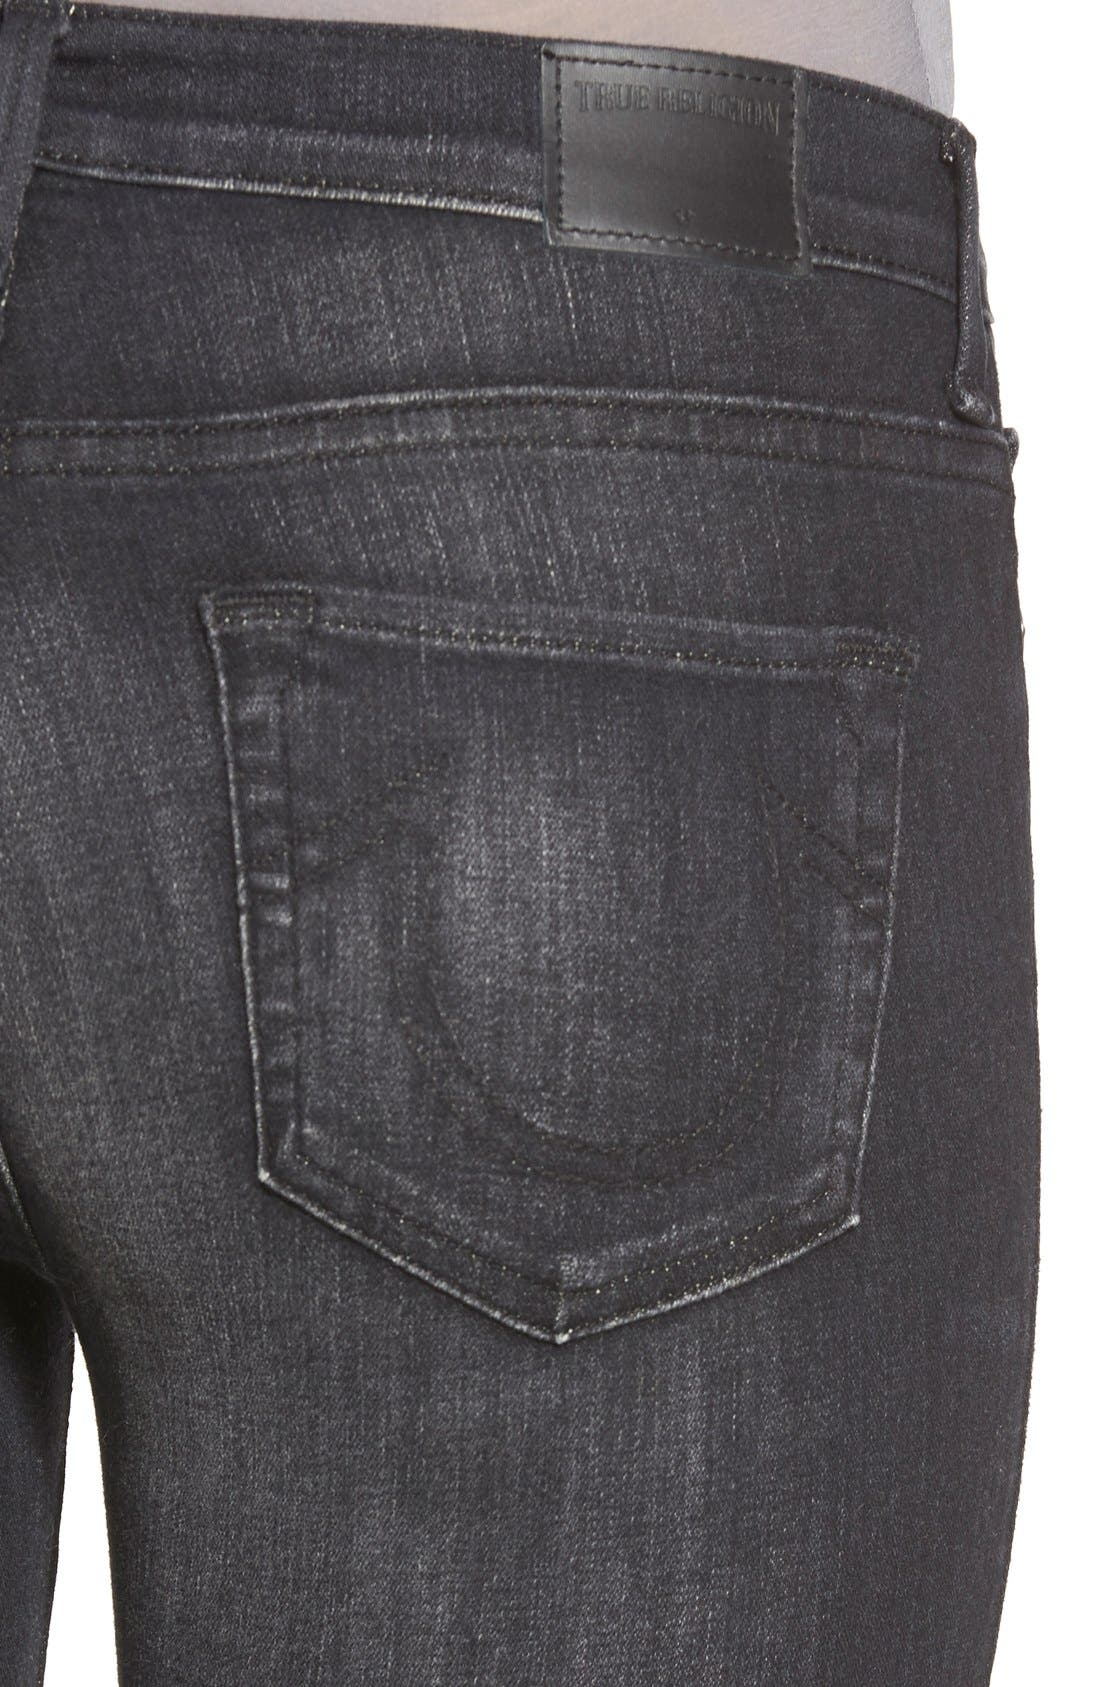 Alternate Image 4  - True Religion Brand Jeans 'Halle' Skinny Jeans (Authentic Black)